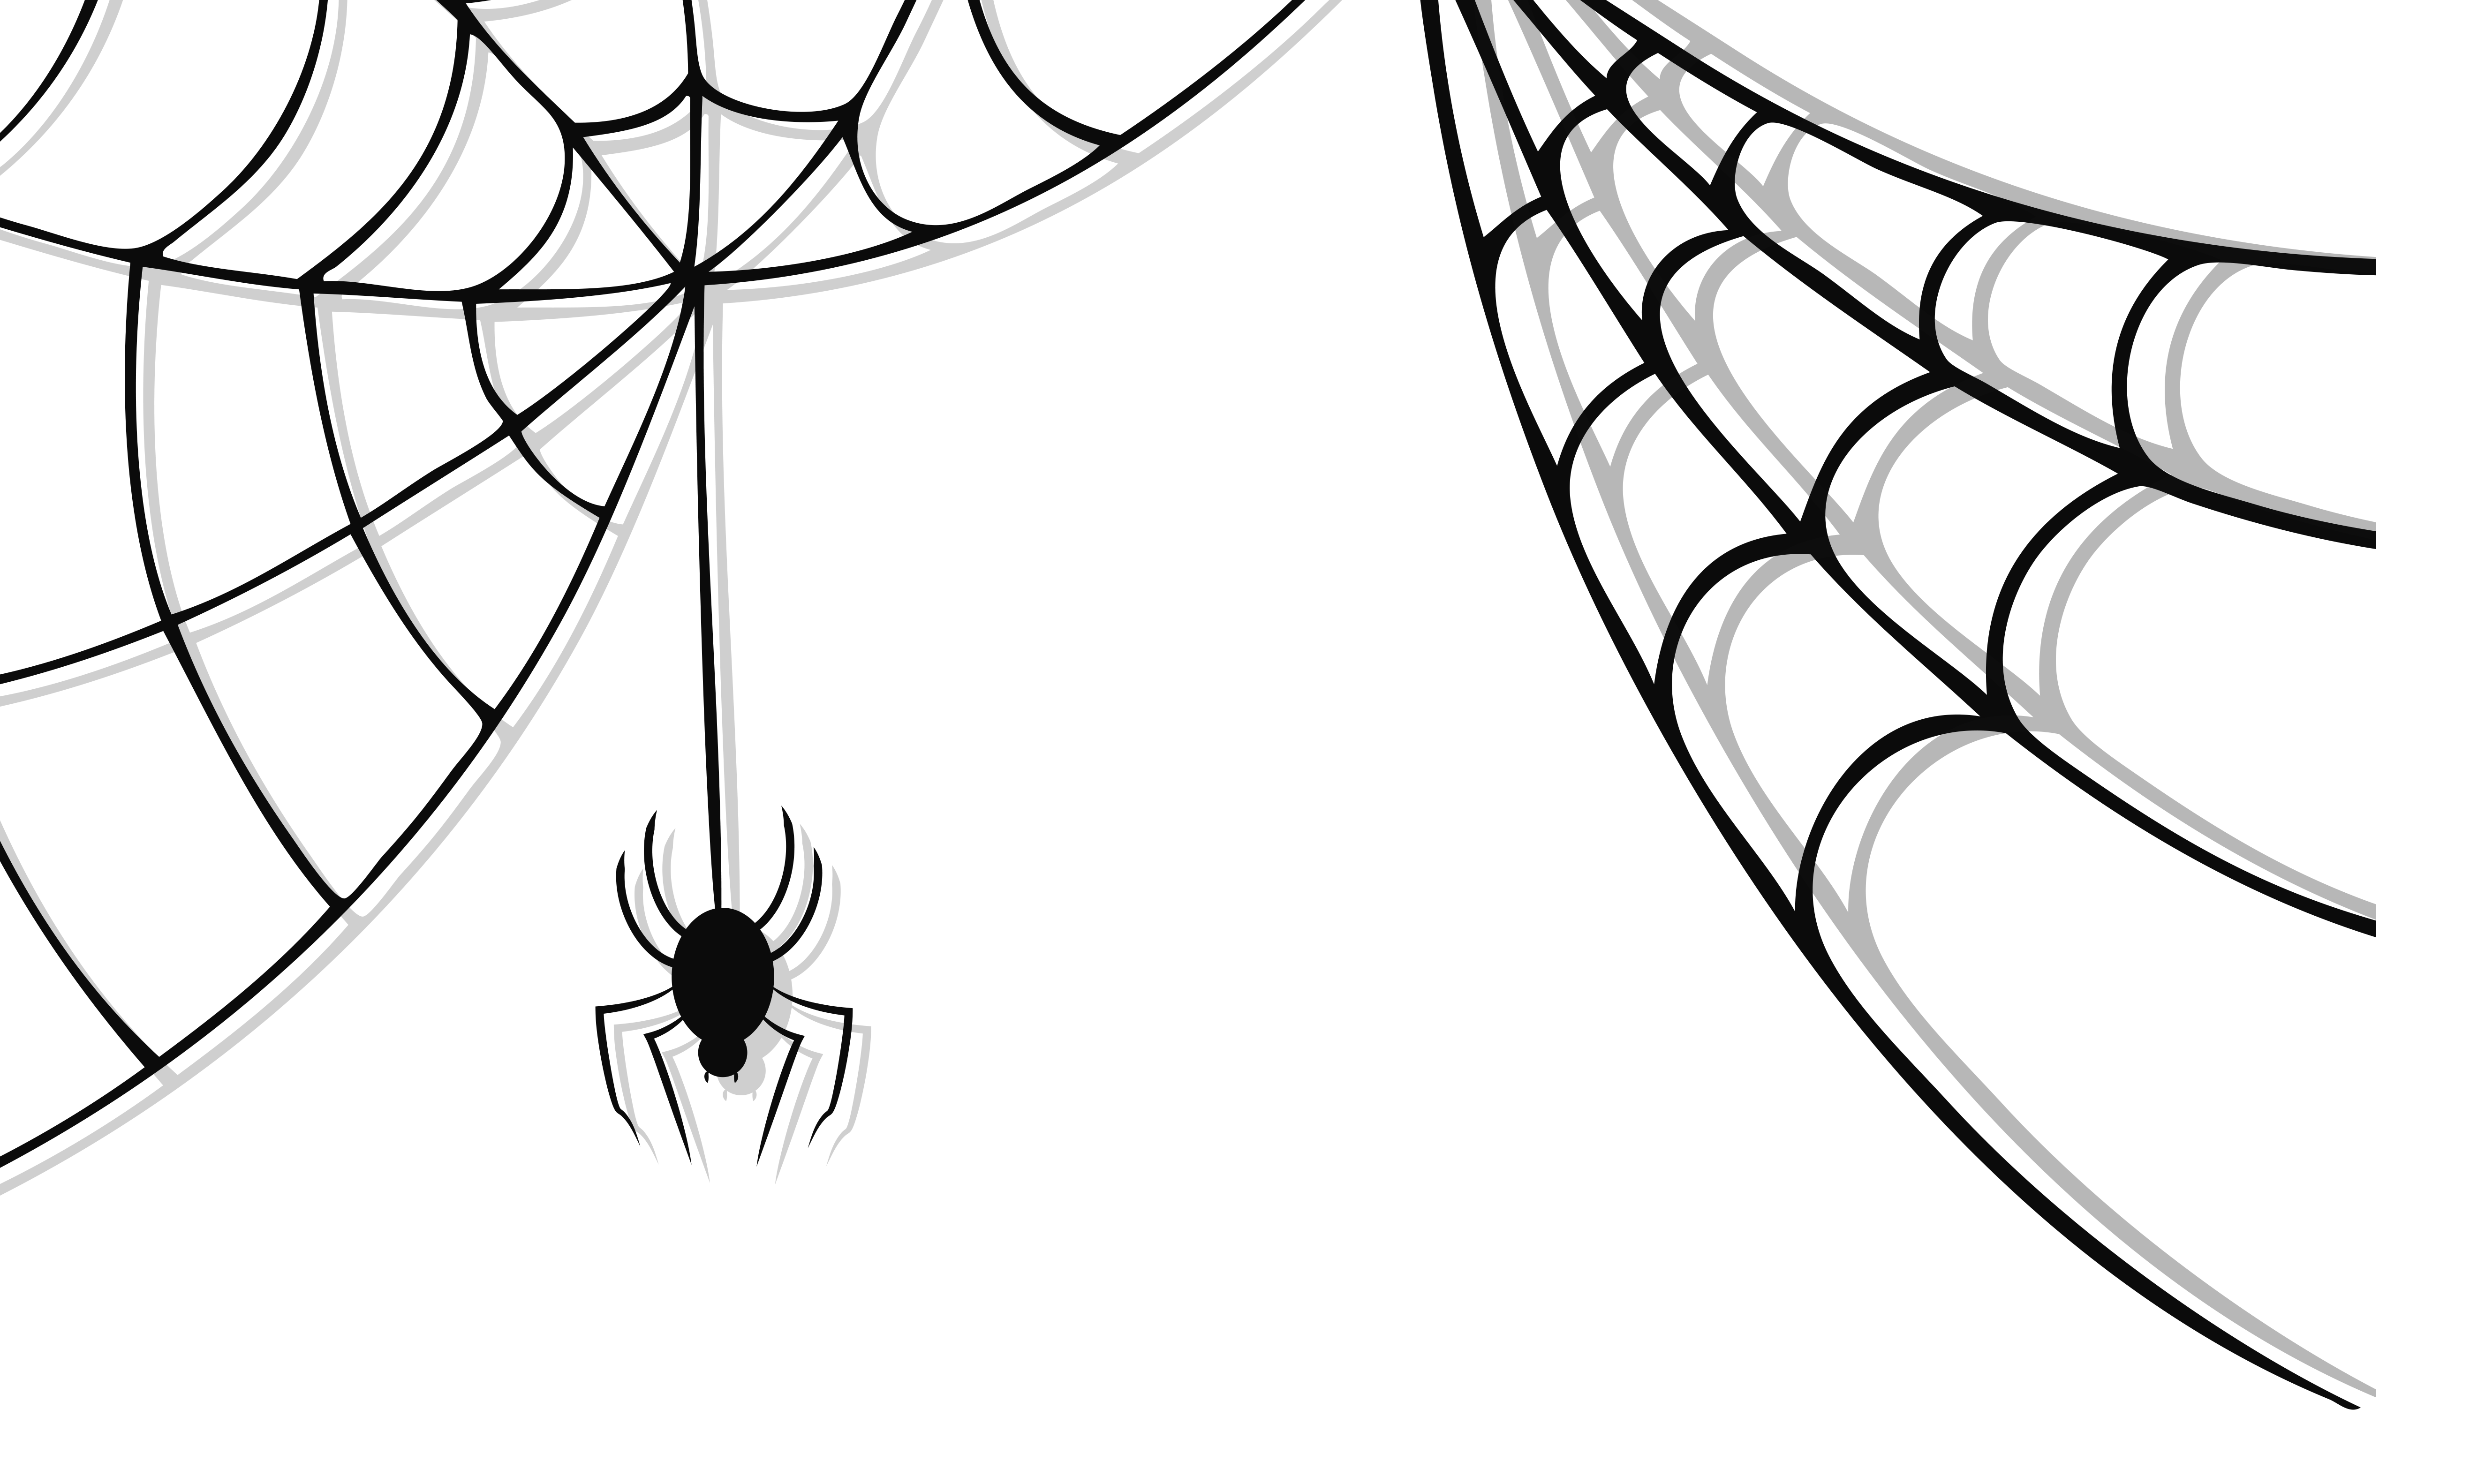 Cute Spider Web Clipart Free Clipart Ima-Cute spider web clipart free clipart images 4 clipartcow-17